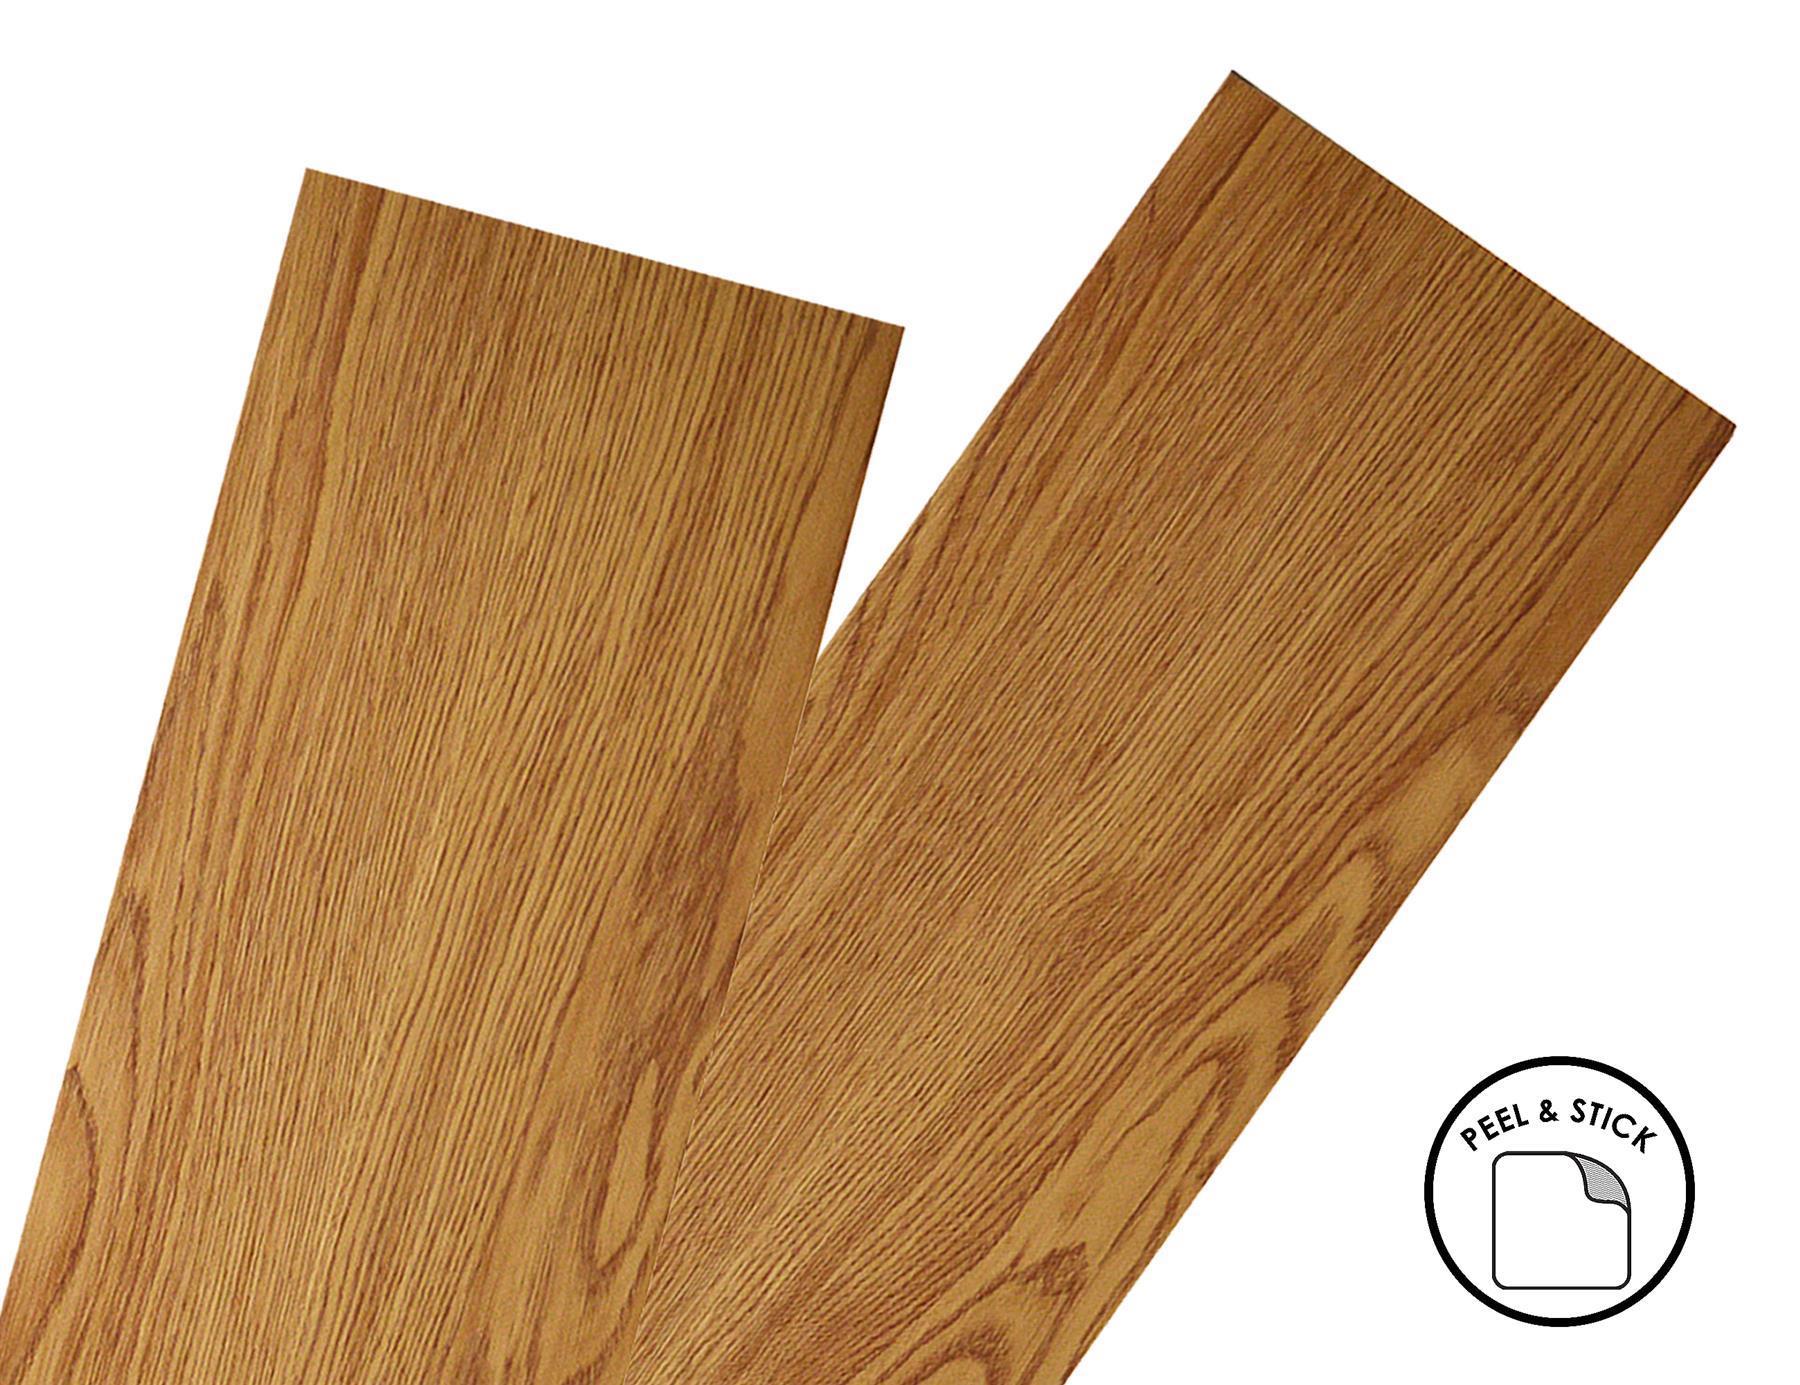 thumbnail 21 - Floor Planks Tiles Self Adhesive Vinyl Brown Wood Flooring Kitchen Bathroom